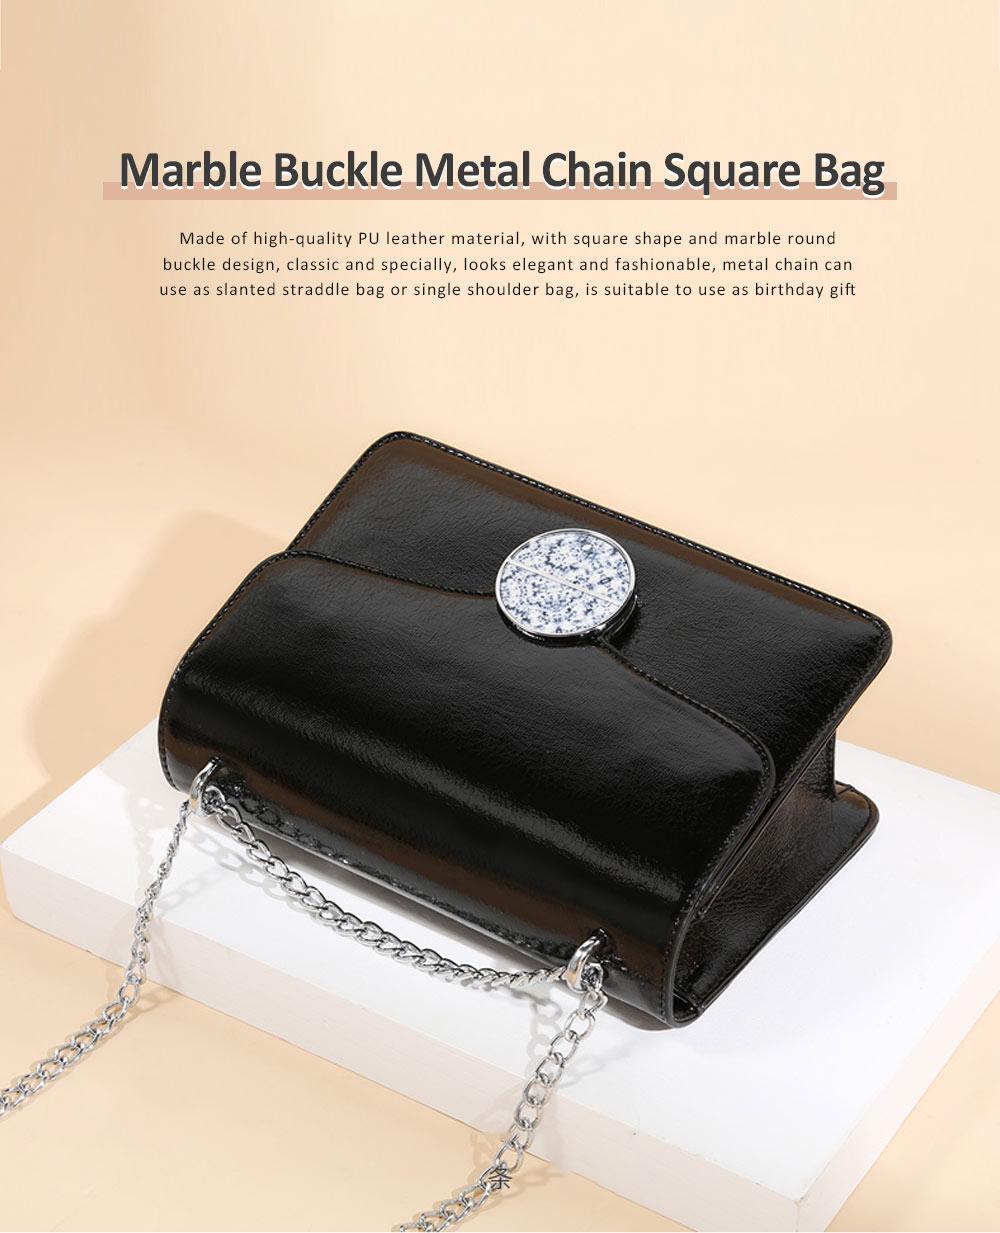 Marble Buckle Metal Chain Square Bag, High-quality PU Leather Handbag with Strap, Black Slanted Straddle Bag Single Shoulder Bag 0